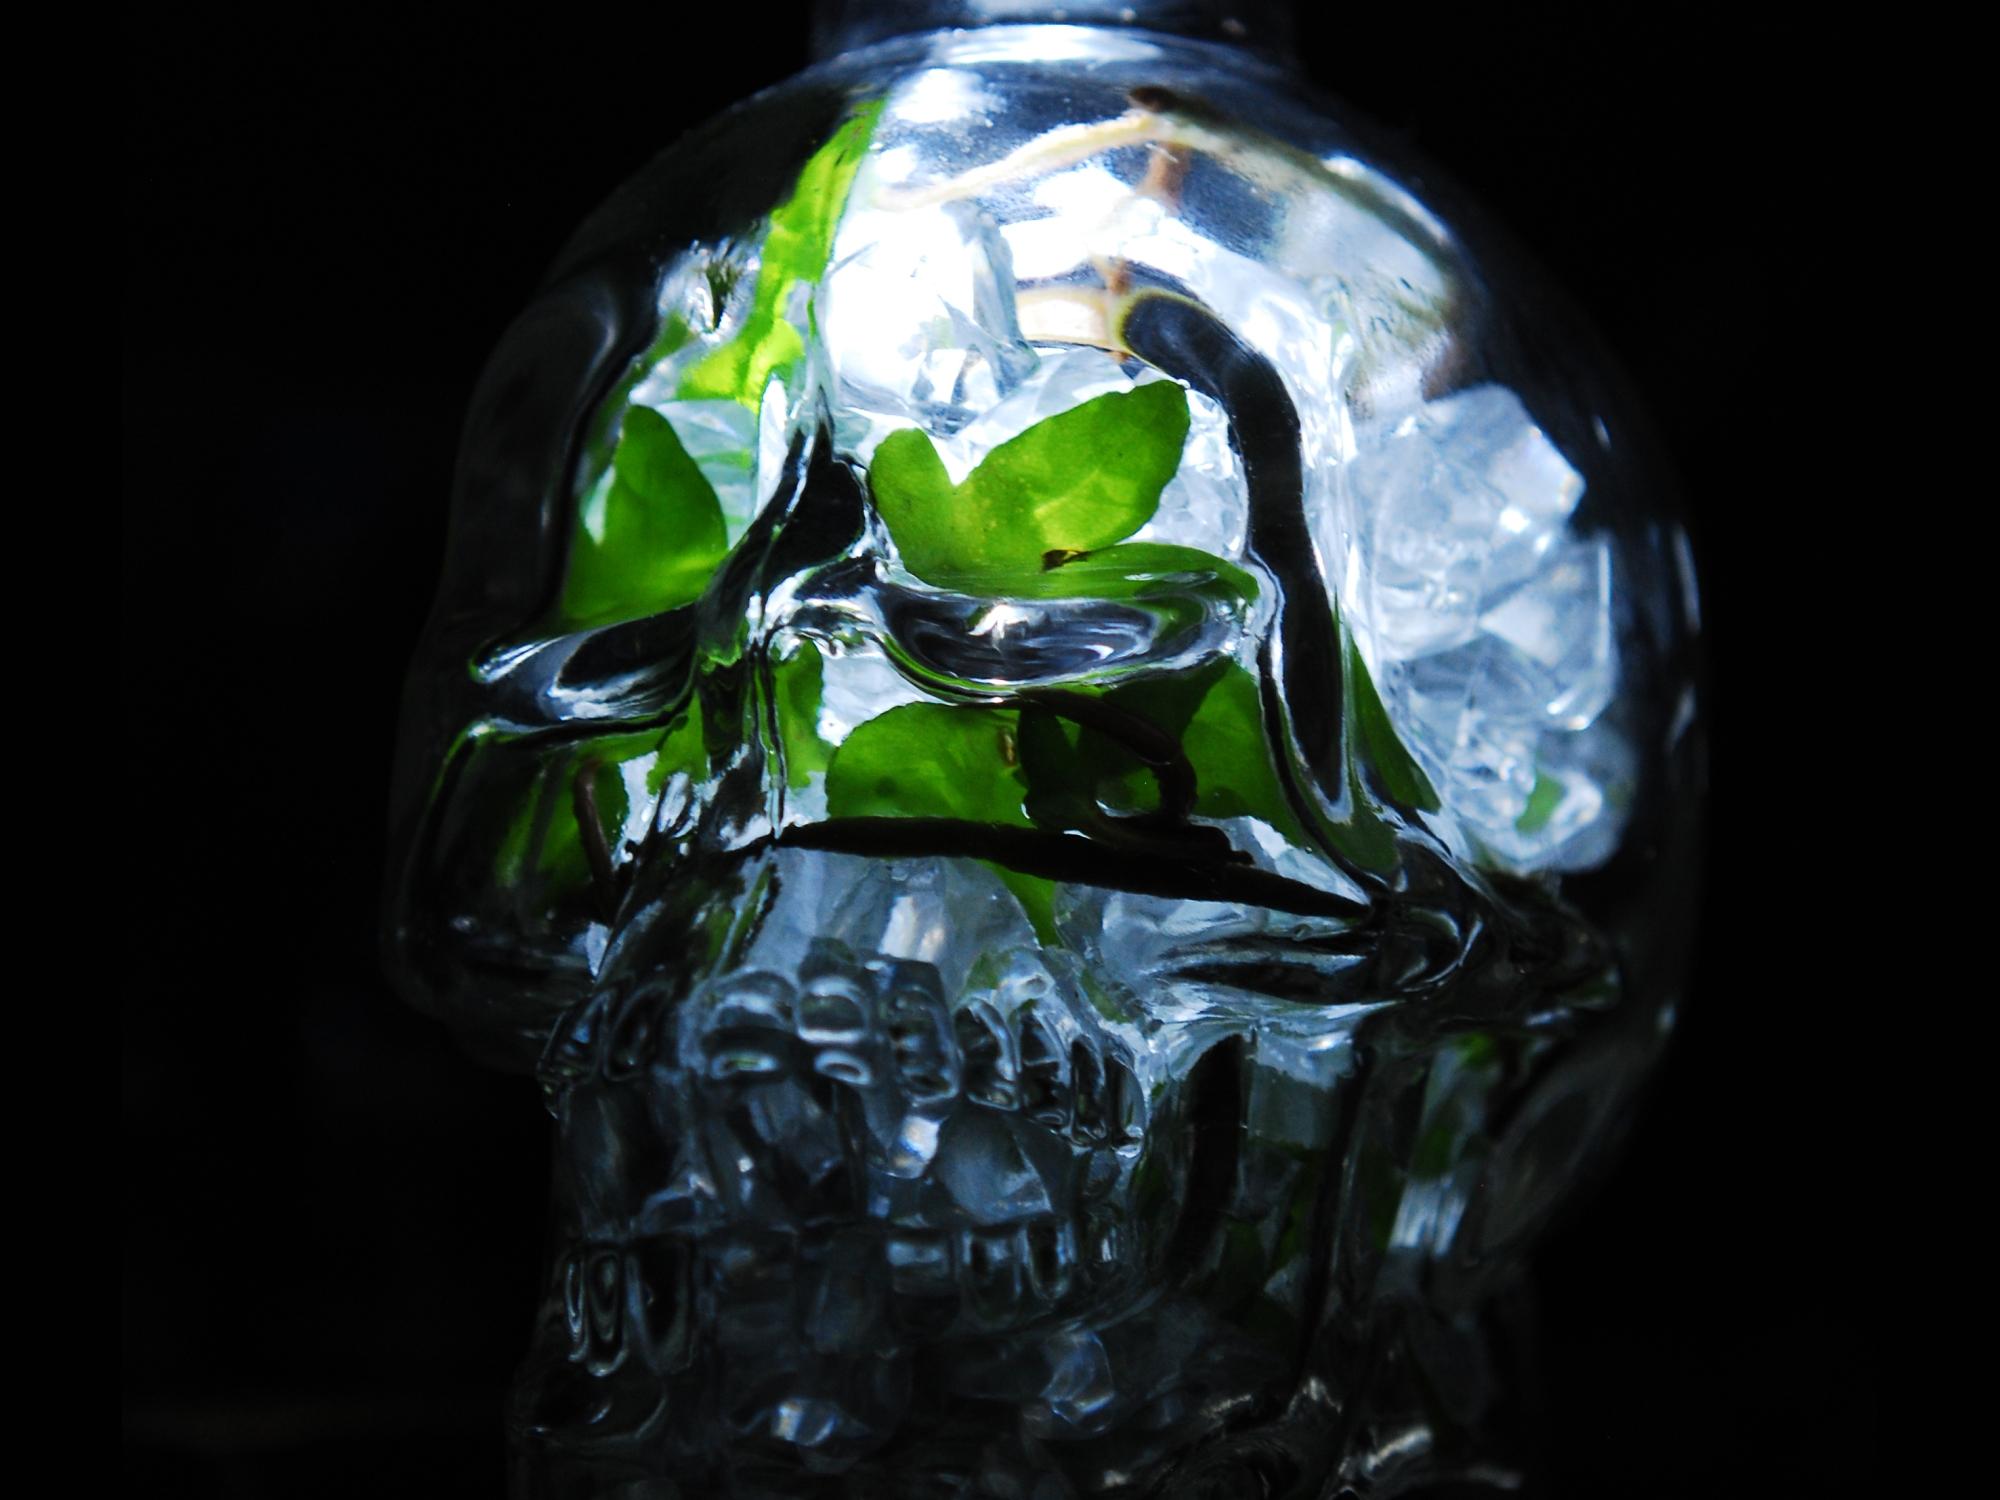 The Crystalline Skull